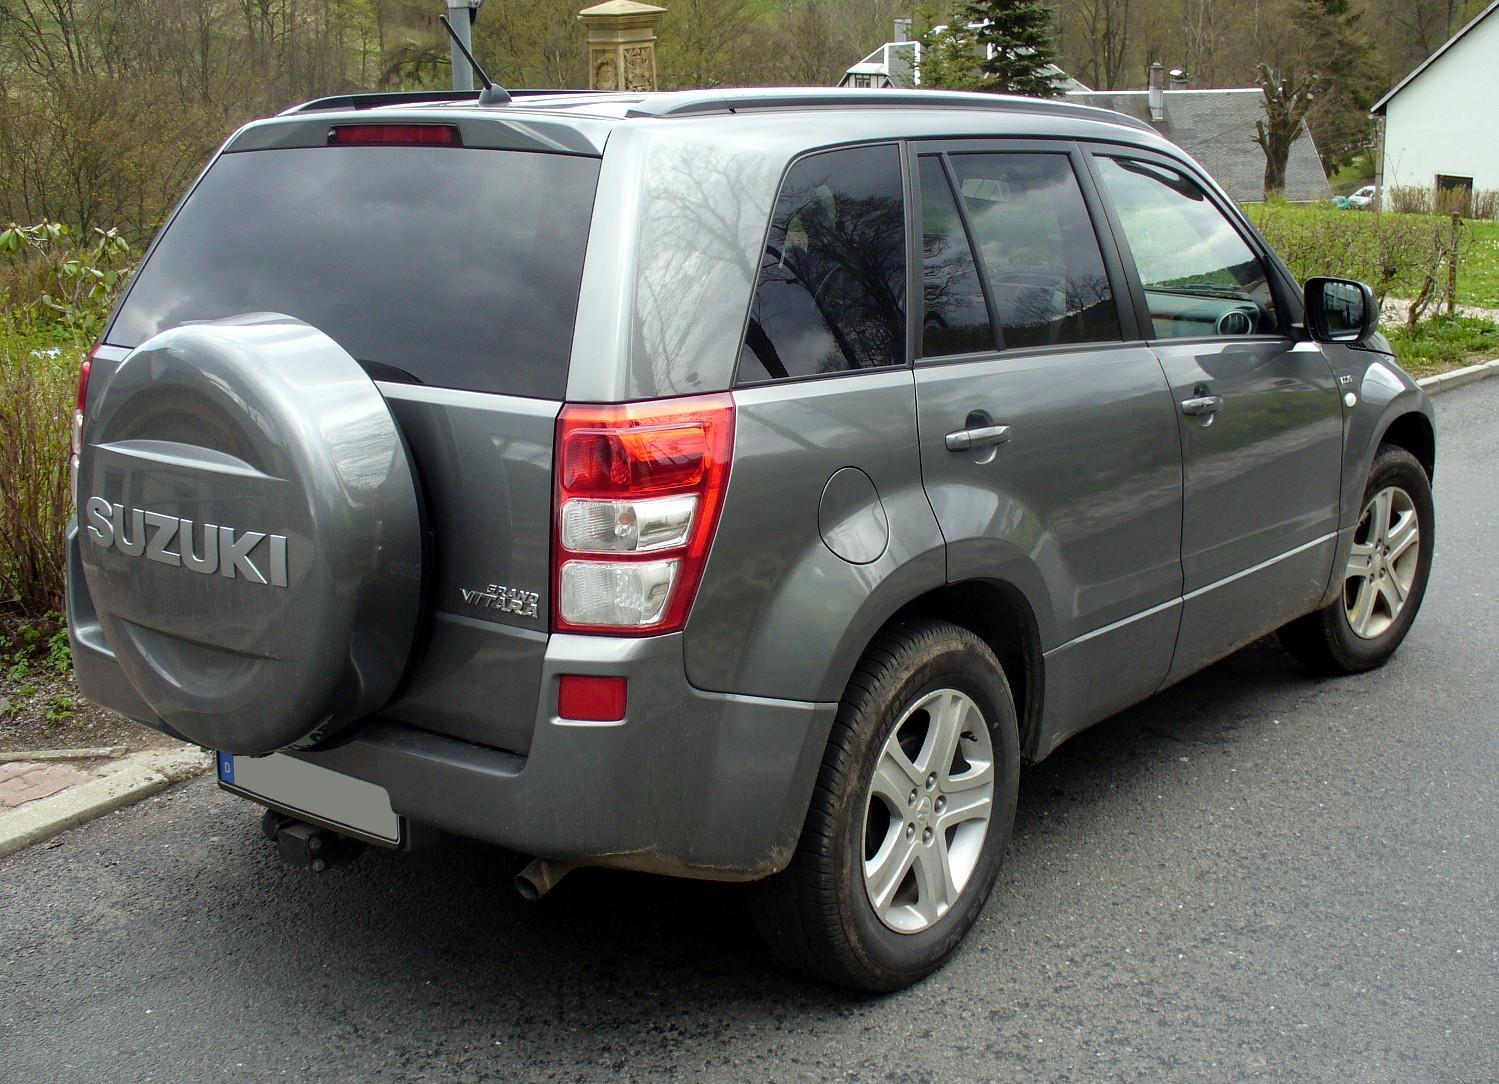 Suzuki Grand Vitara Exterior Cars